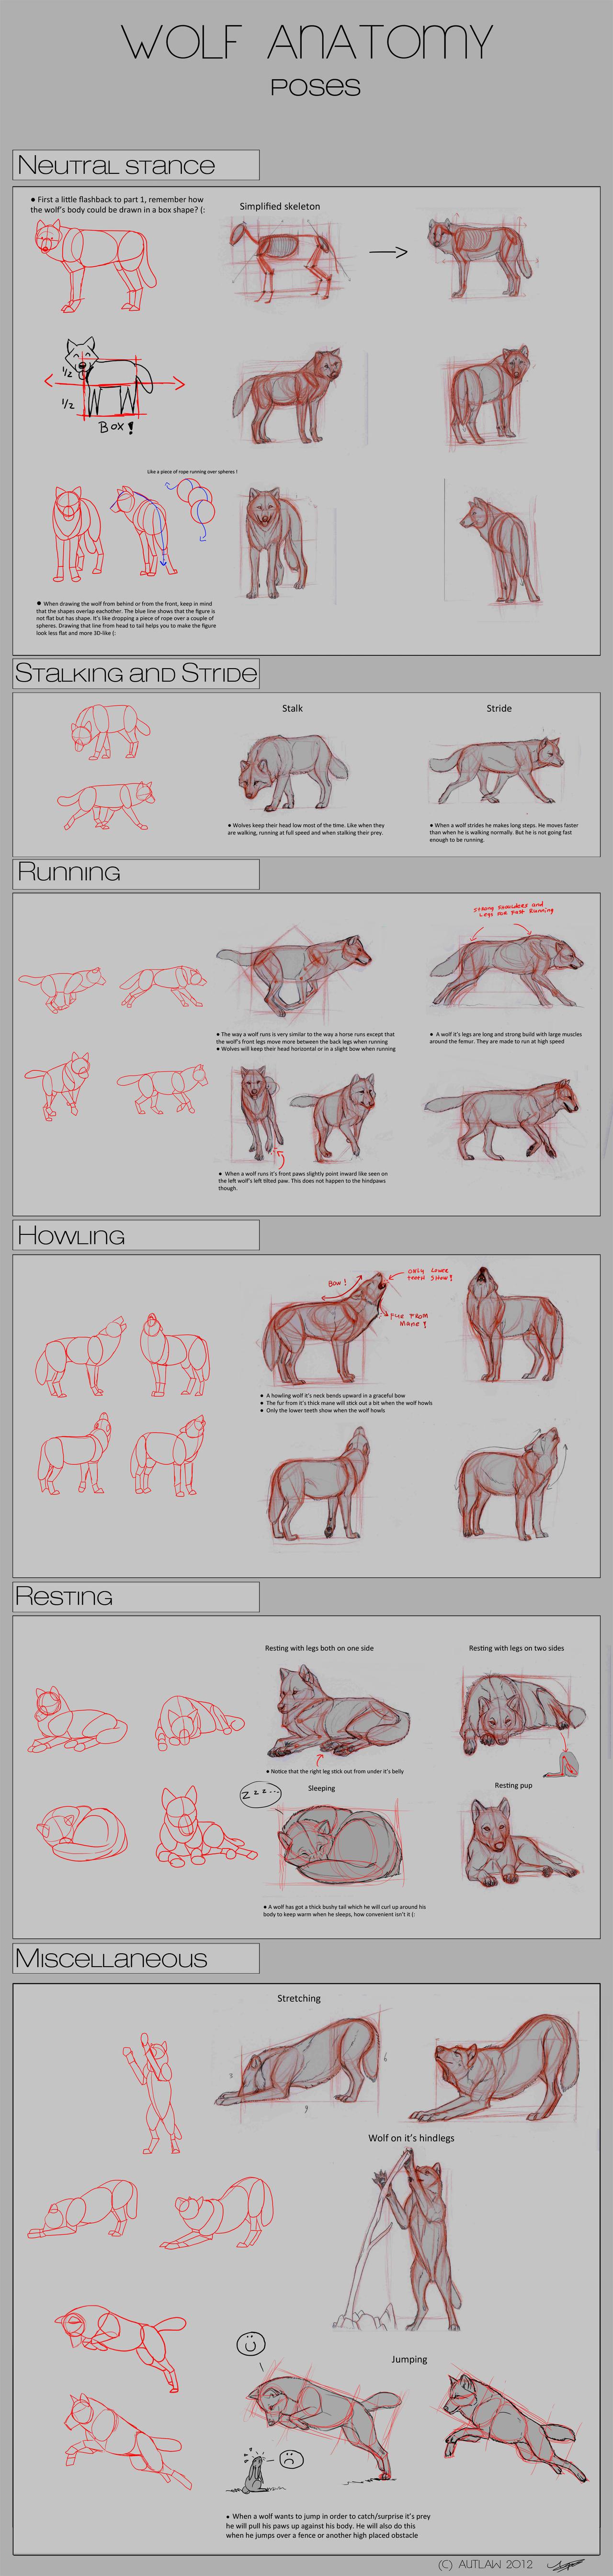 http://fc04.deviantart.net/fs70/i/2012/279/d/c/wolf_anatomy___part_2_by_autlaw-d5gsjeh.jpg